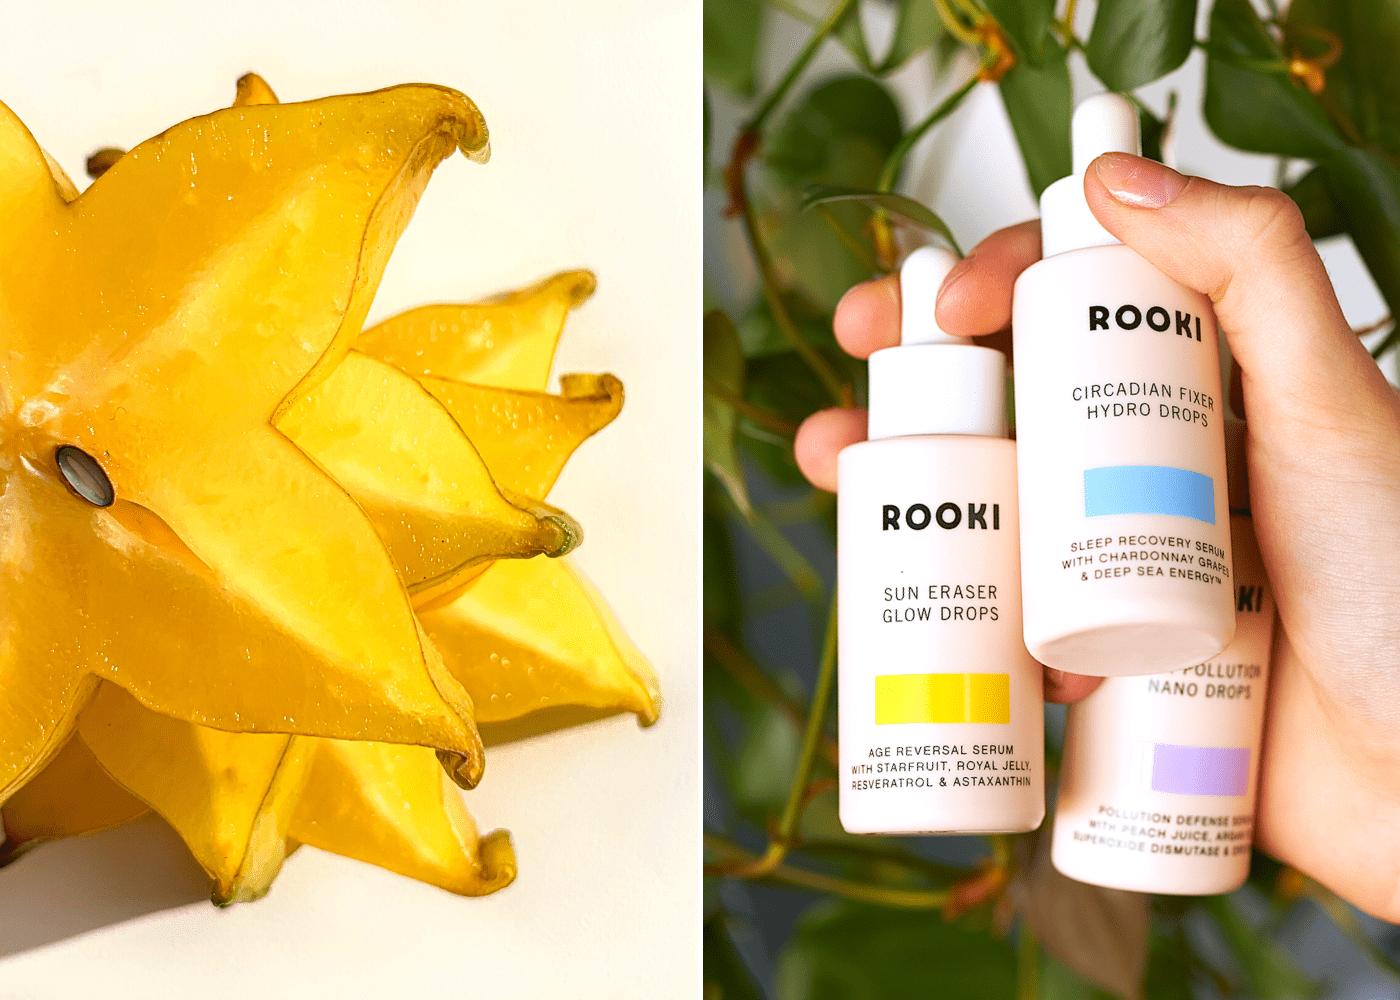 Superfood infused skincare from Rooki